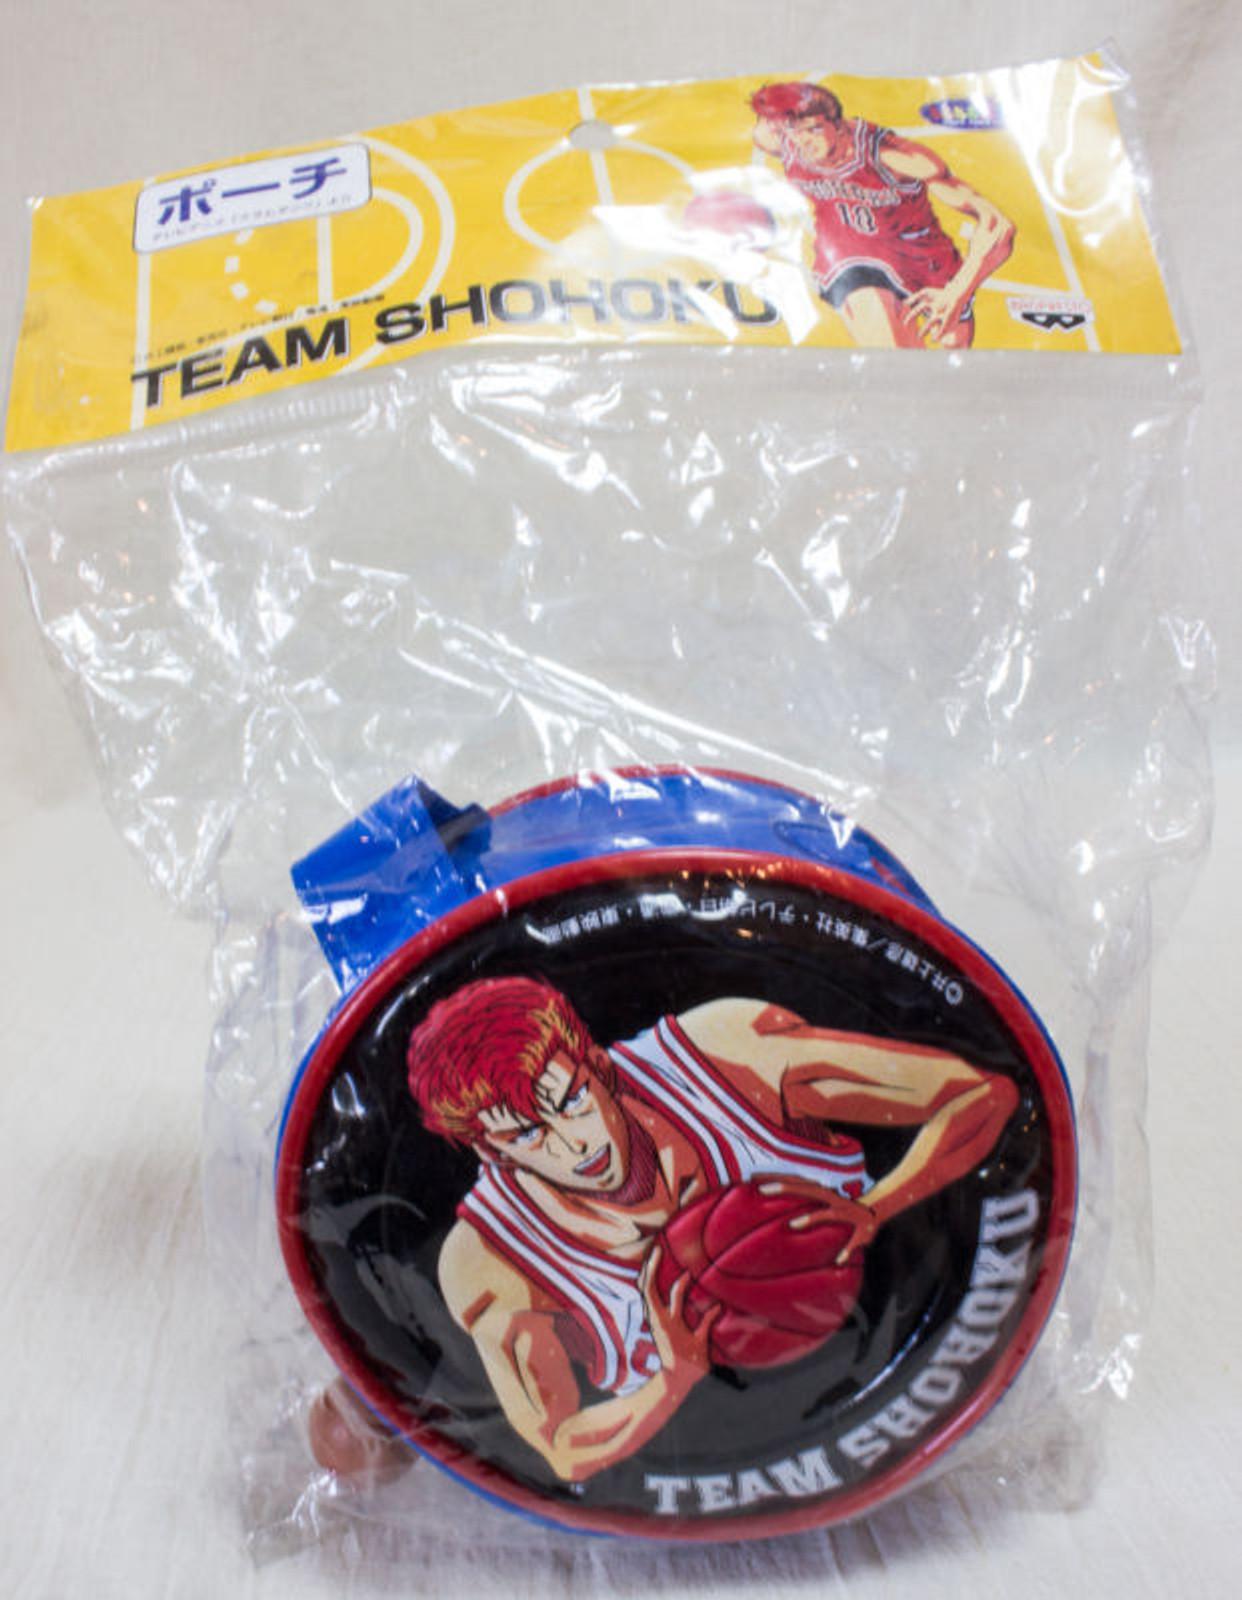 SLAM DUNK Hanamichi Sakuragi Team Shohoku Pouch Mini Bag Banpresto JAPAN ANIME MANGA